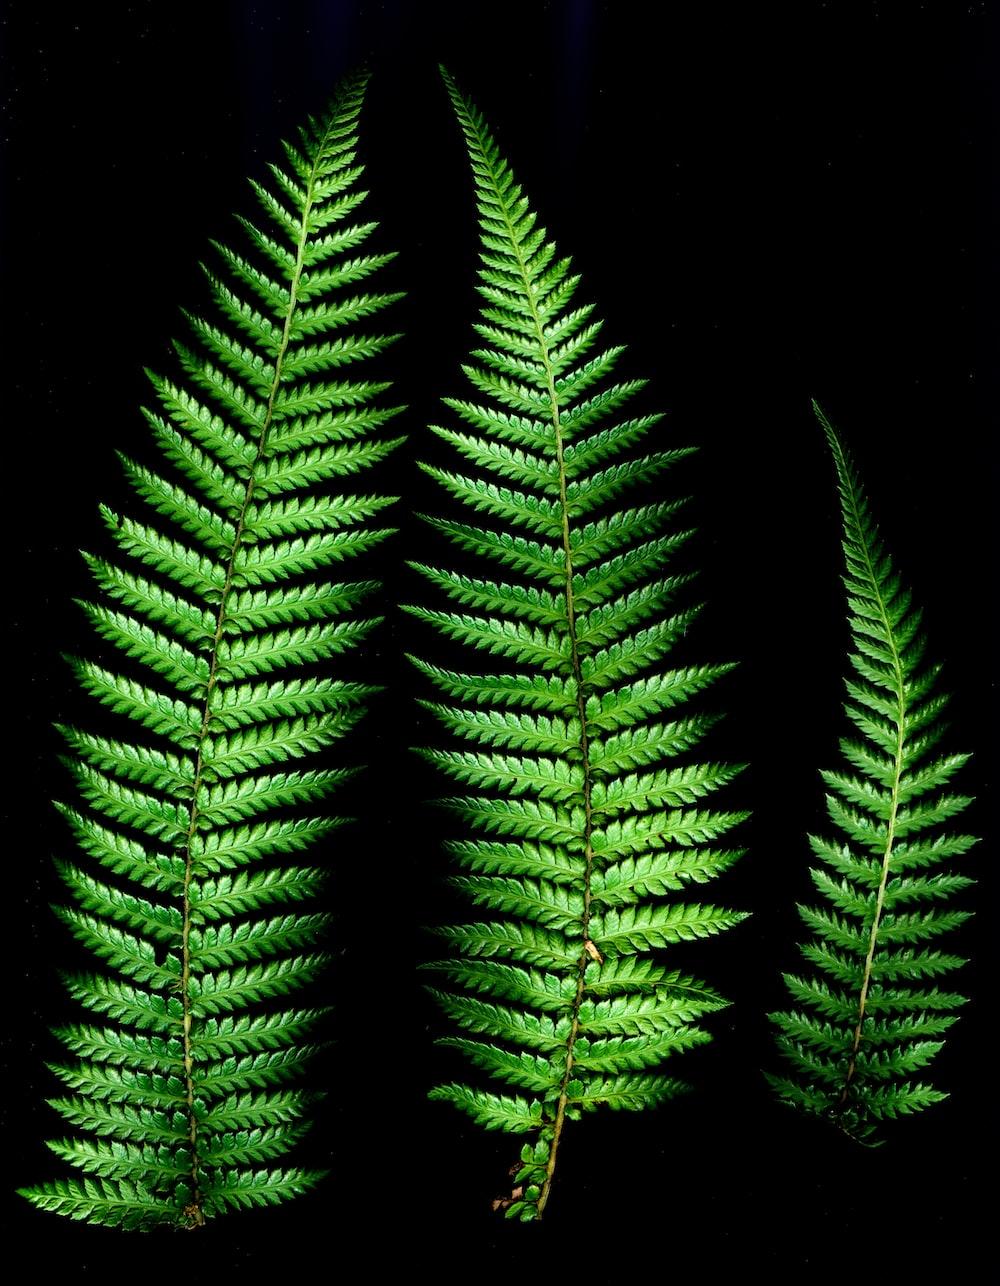 three green fern leaves